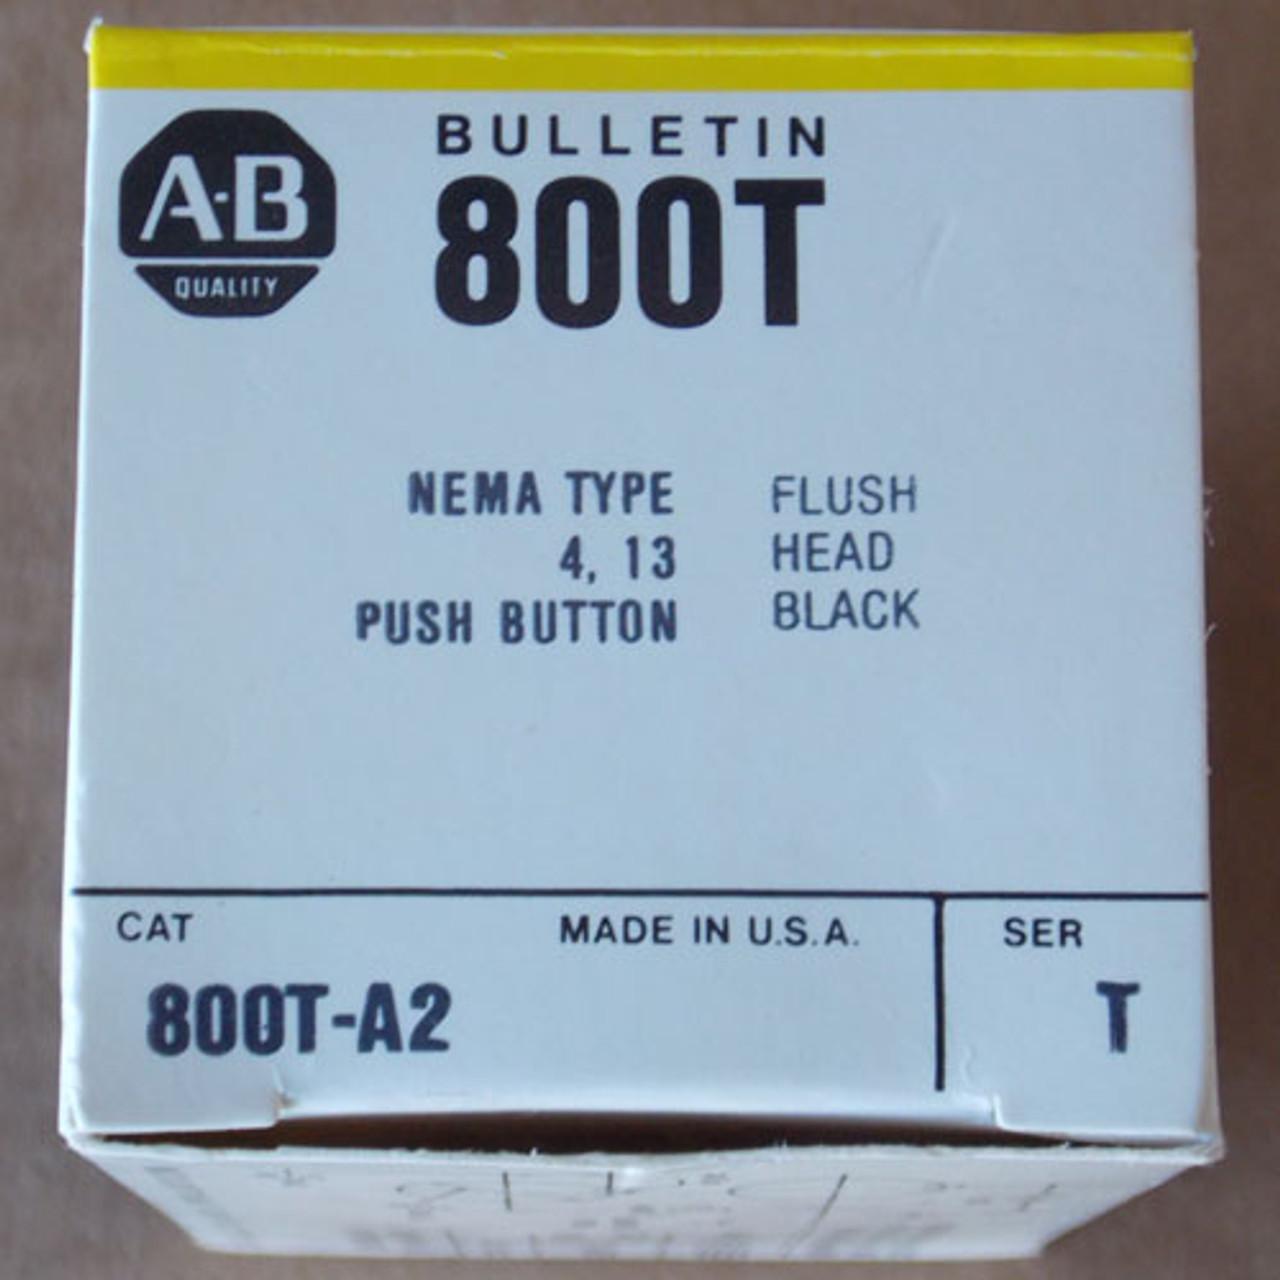 Allen-Bradley 800T-AT Flush Pushbutton Head Black, Nema 4,13 - New